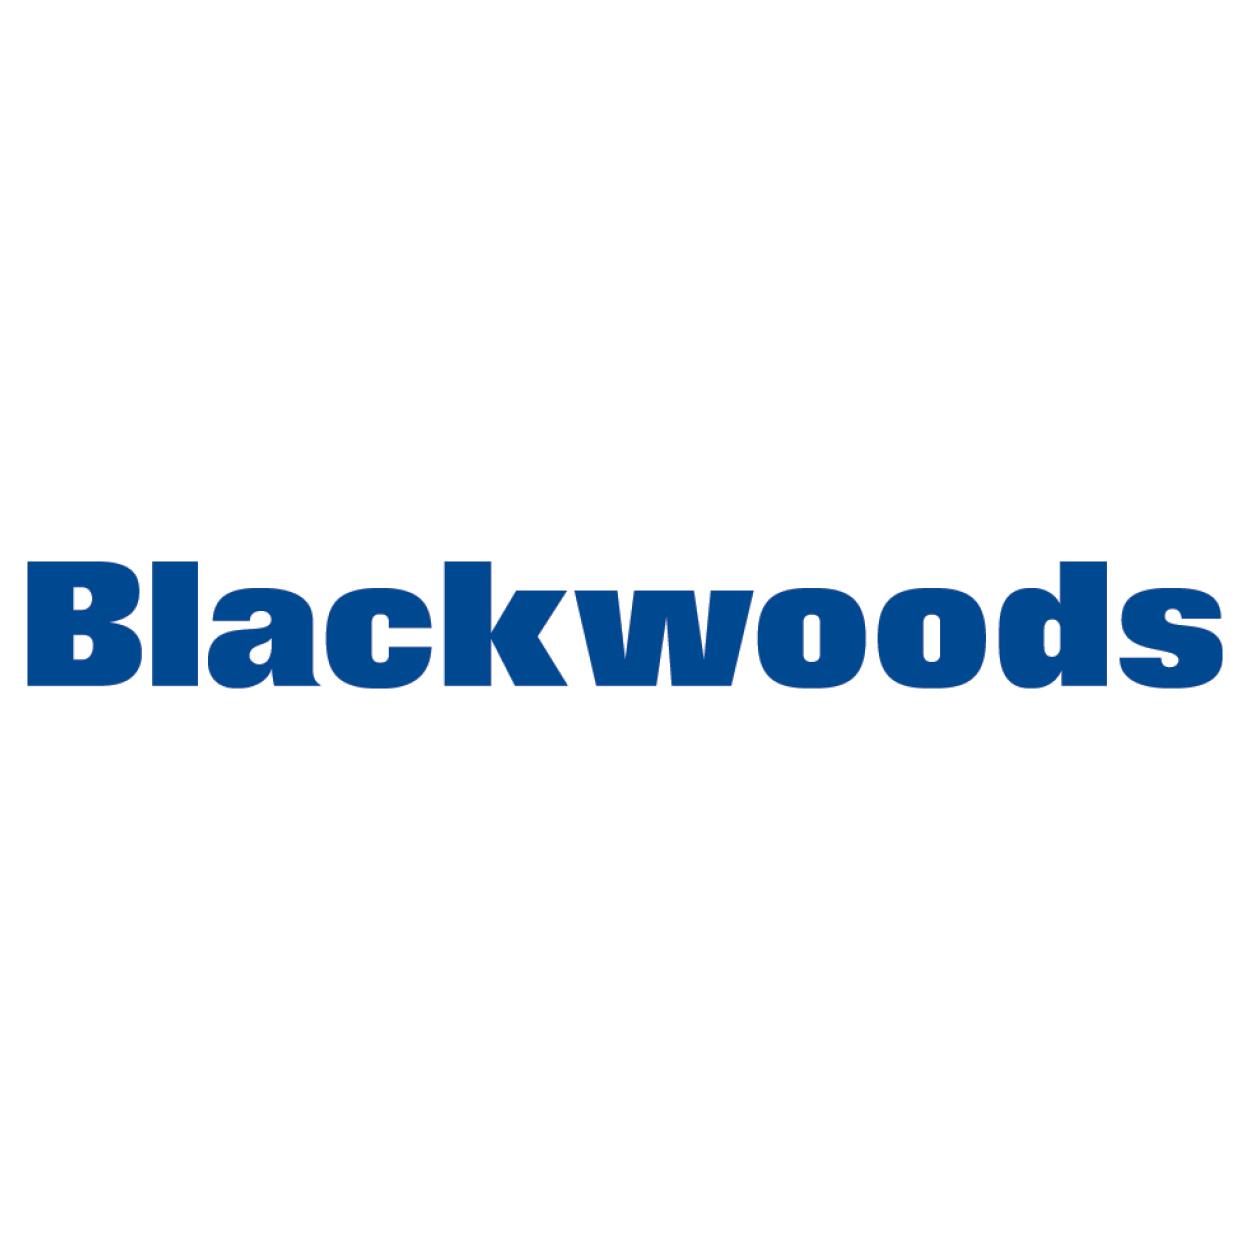 http://www.huntersafetyawards.com.au/blog/blackwoods-support-workplace-safety-in-the-hunter-business-community